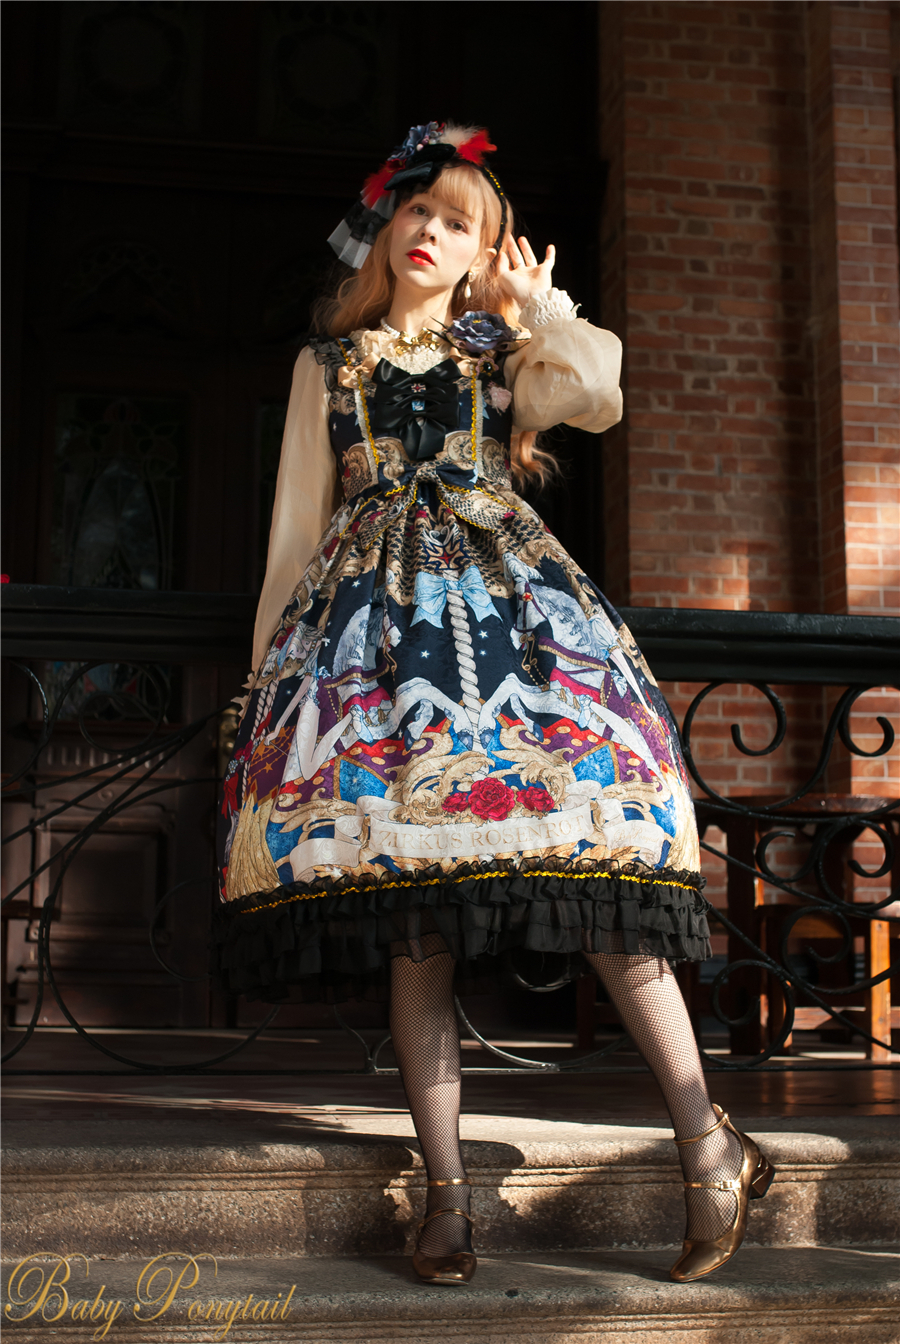 Baby Ponytail_Circus Princess_Black JSK_Claudia_08.jpg